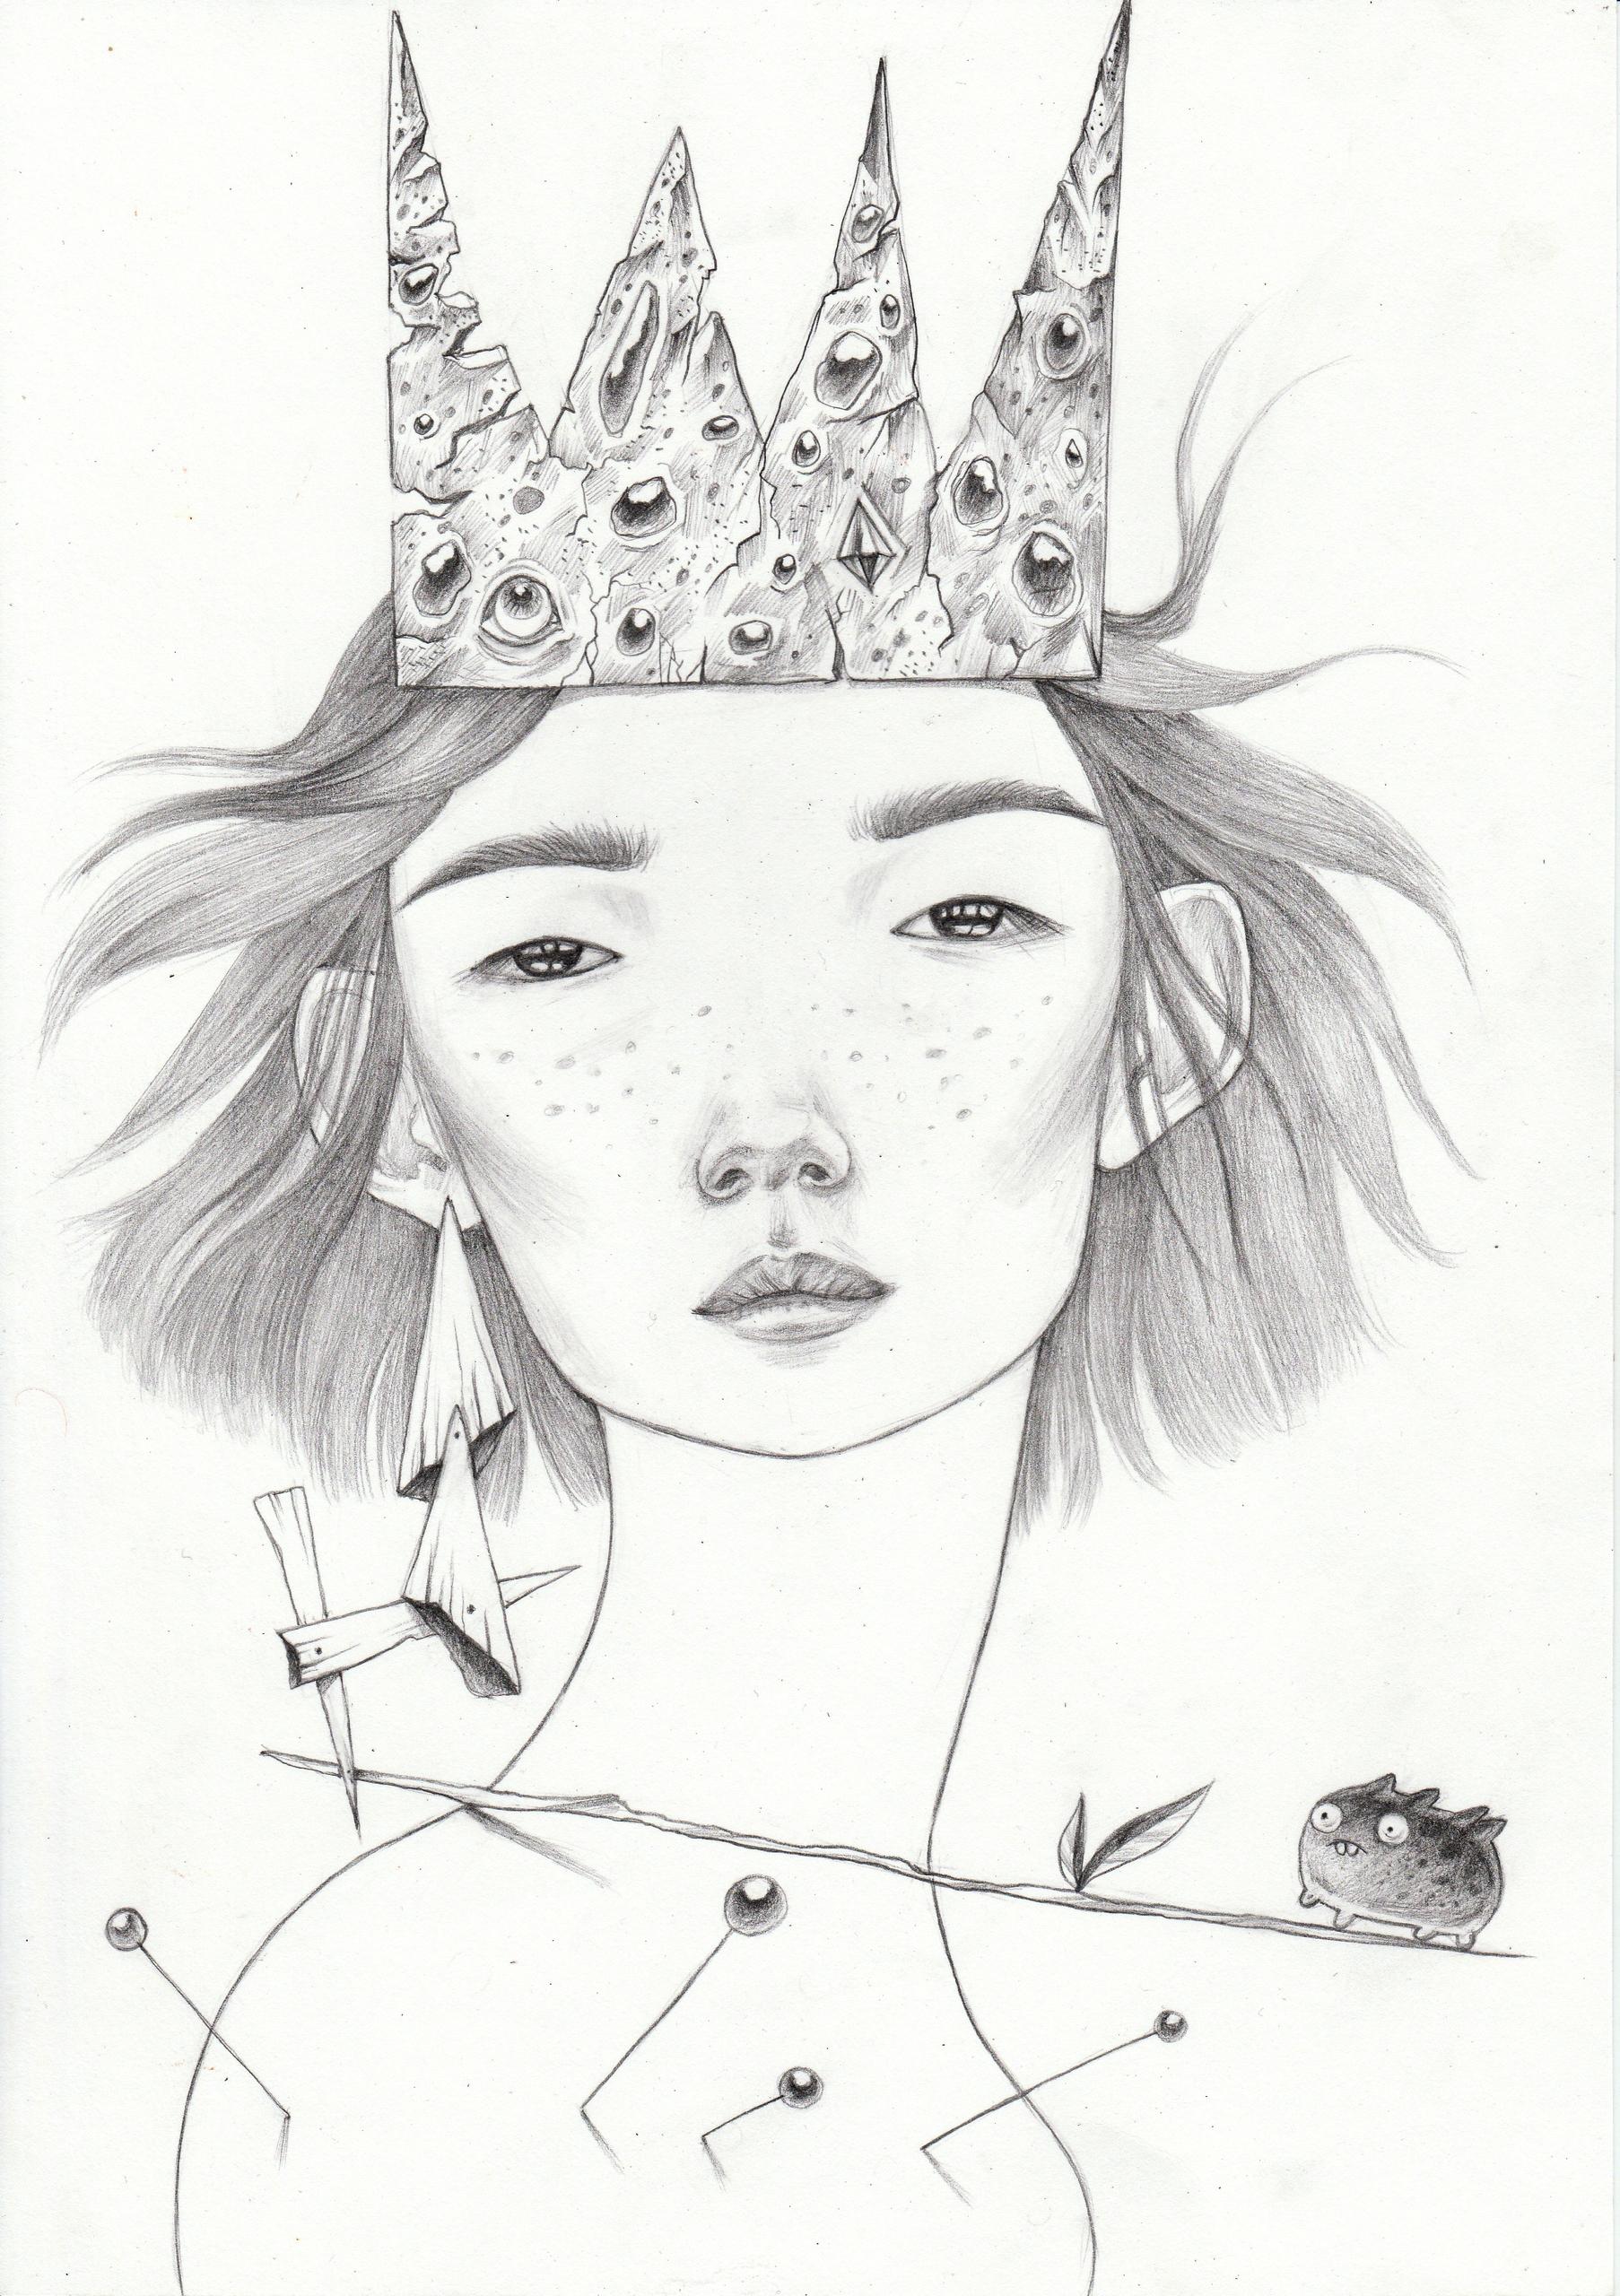 Young - illustration, characterdesign - shpadyreva | ello